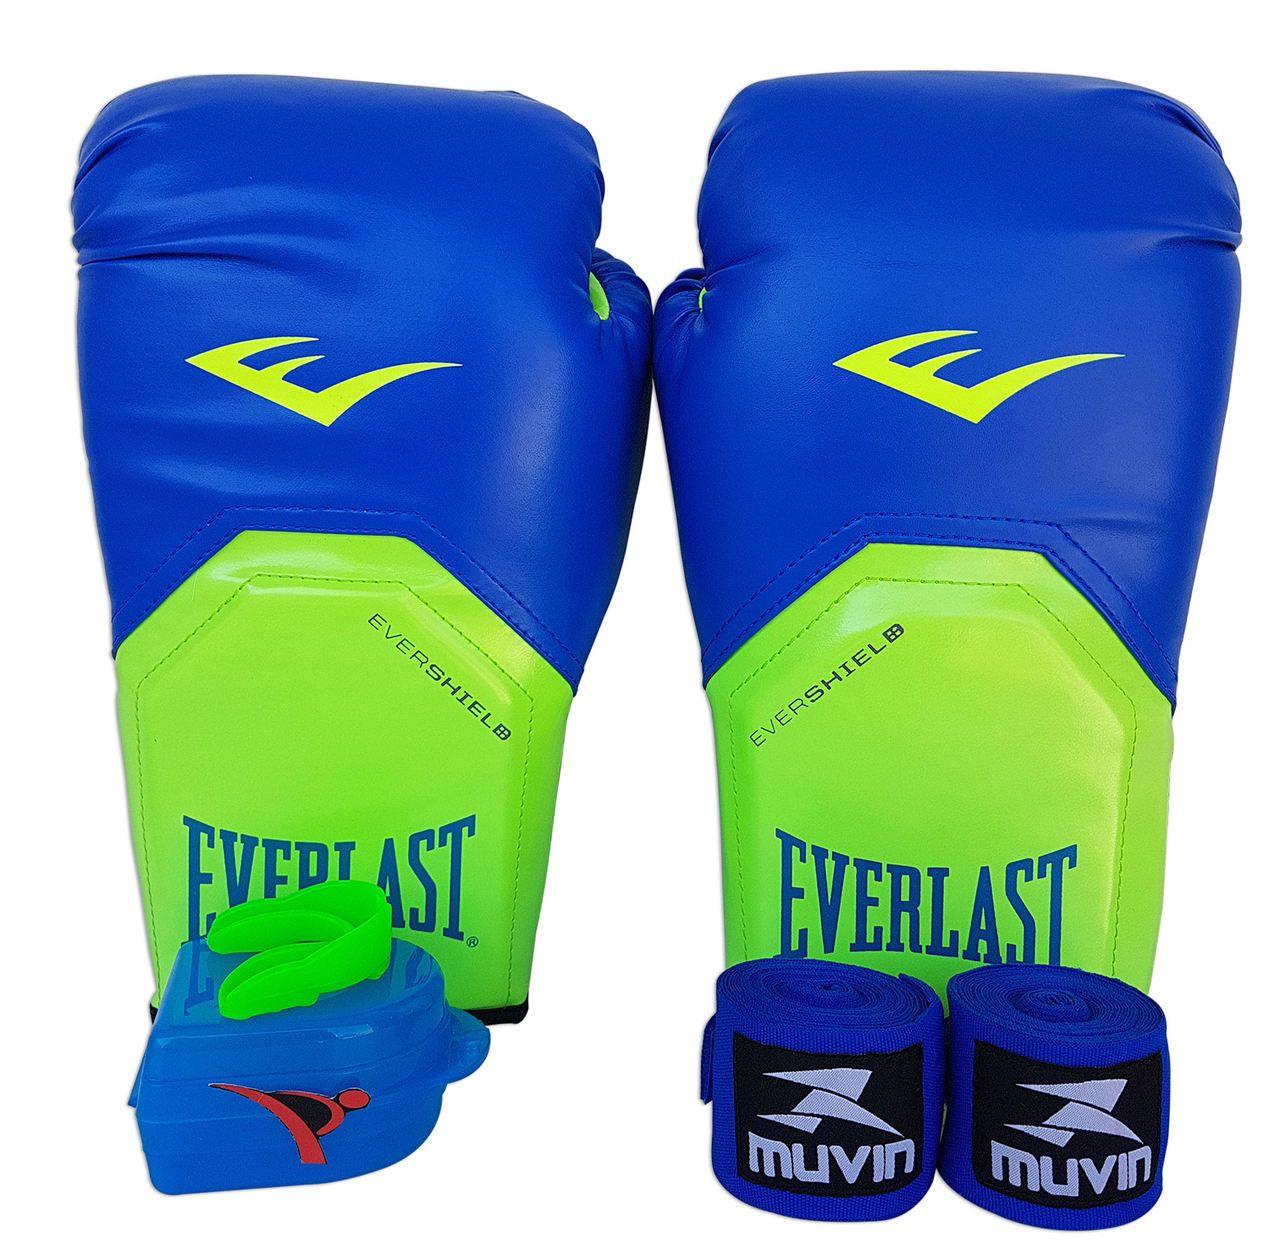 Kit de Boxe / Muay Thai 14oz - Azul com Verde - Pro Style - Everlast  - PRALUTA SHOP